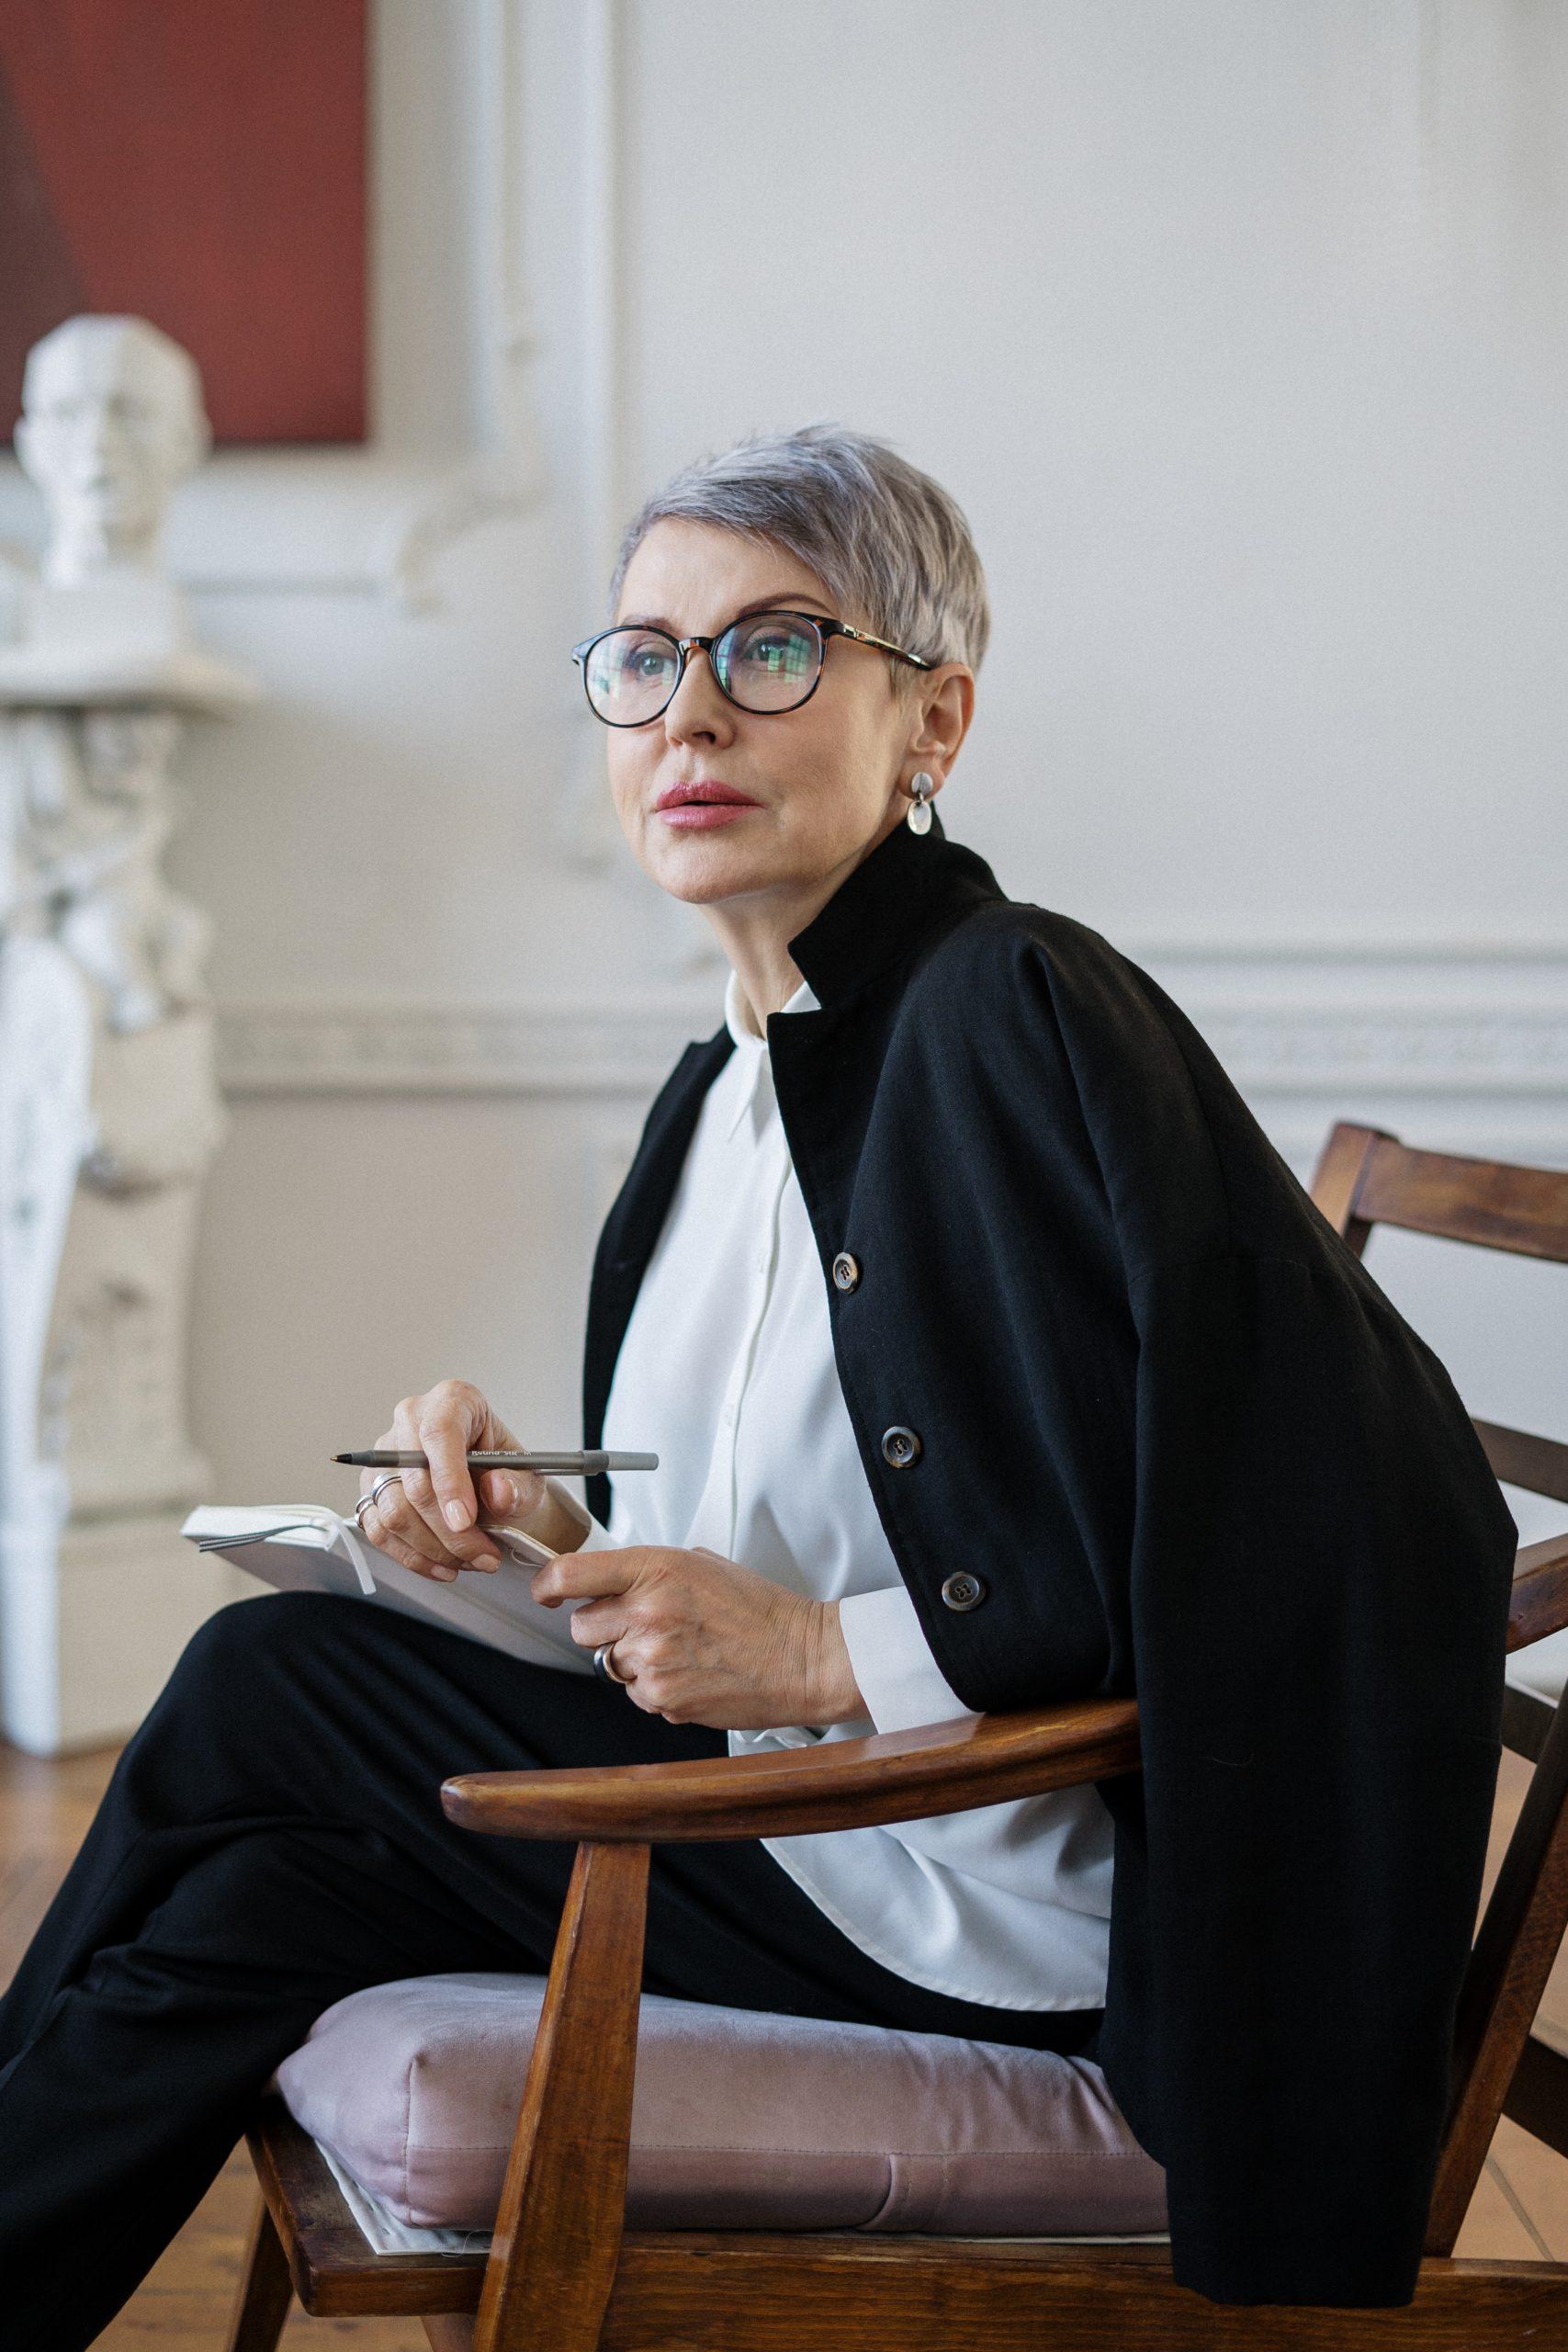 woman-in-black-blazer-sitting-on-brown-wooden-chair